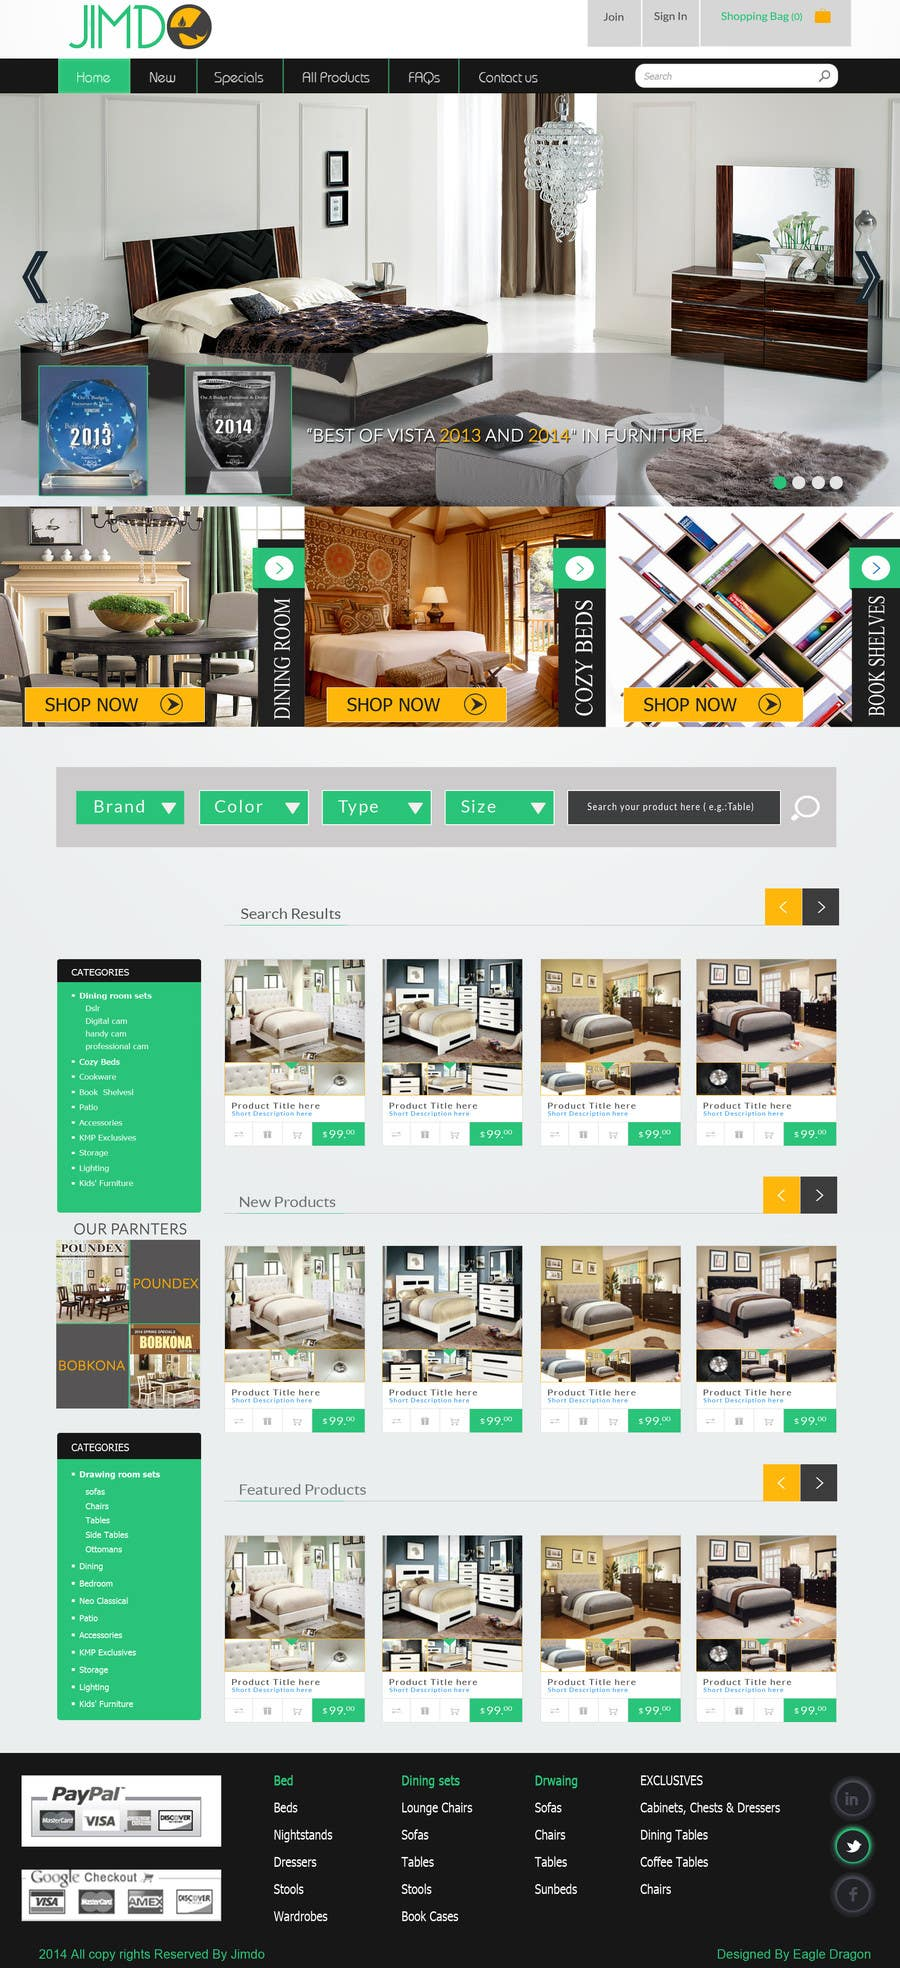 Bài tham dự cuộc thi #                                        3                                      cho                                         Design a Website Mockuup for Jimdo Site